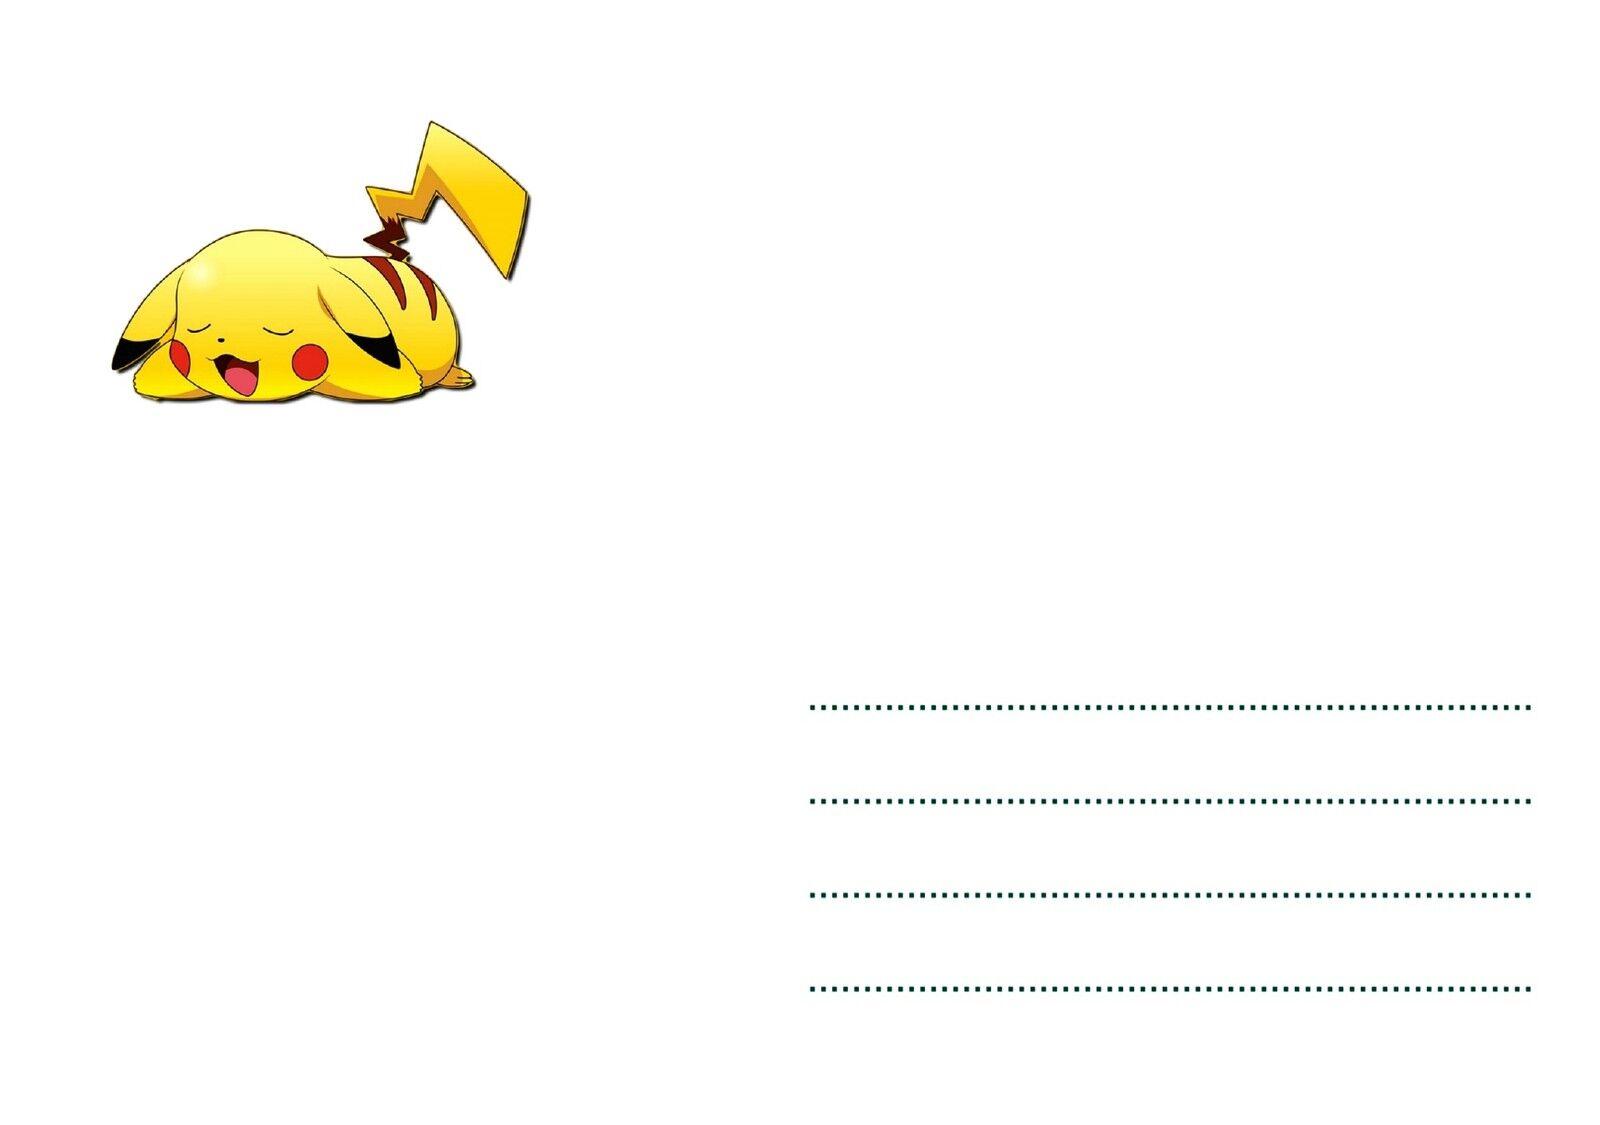 5 ou 12 cartes invitation anniversaire pokemon ref 291 eur 2 99 picclick fr. Black Bedroom Furniture Sets. Home Design Ideas